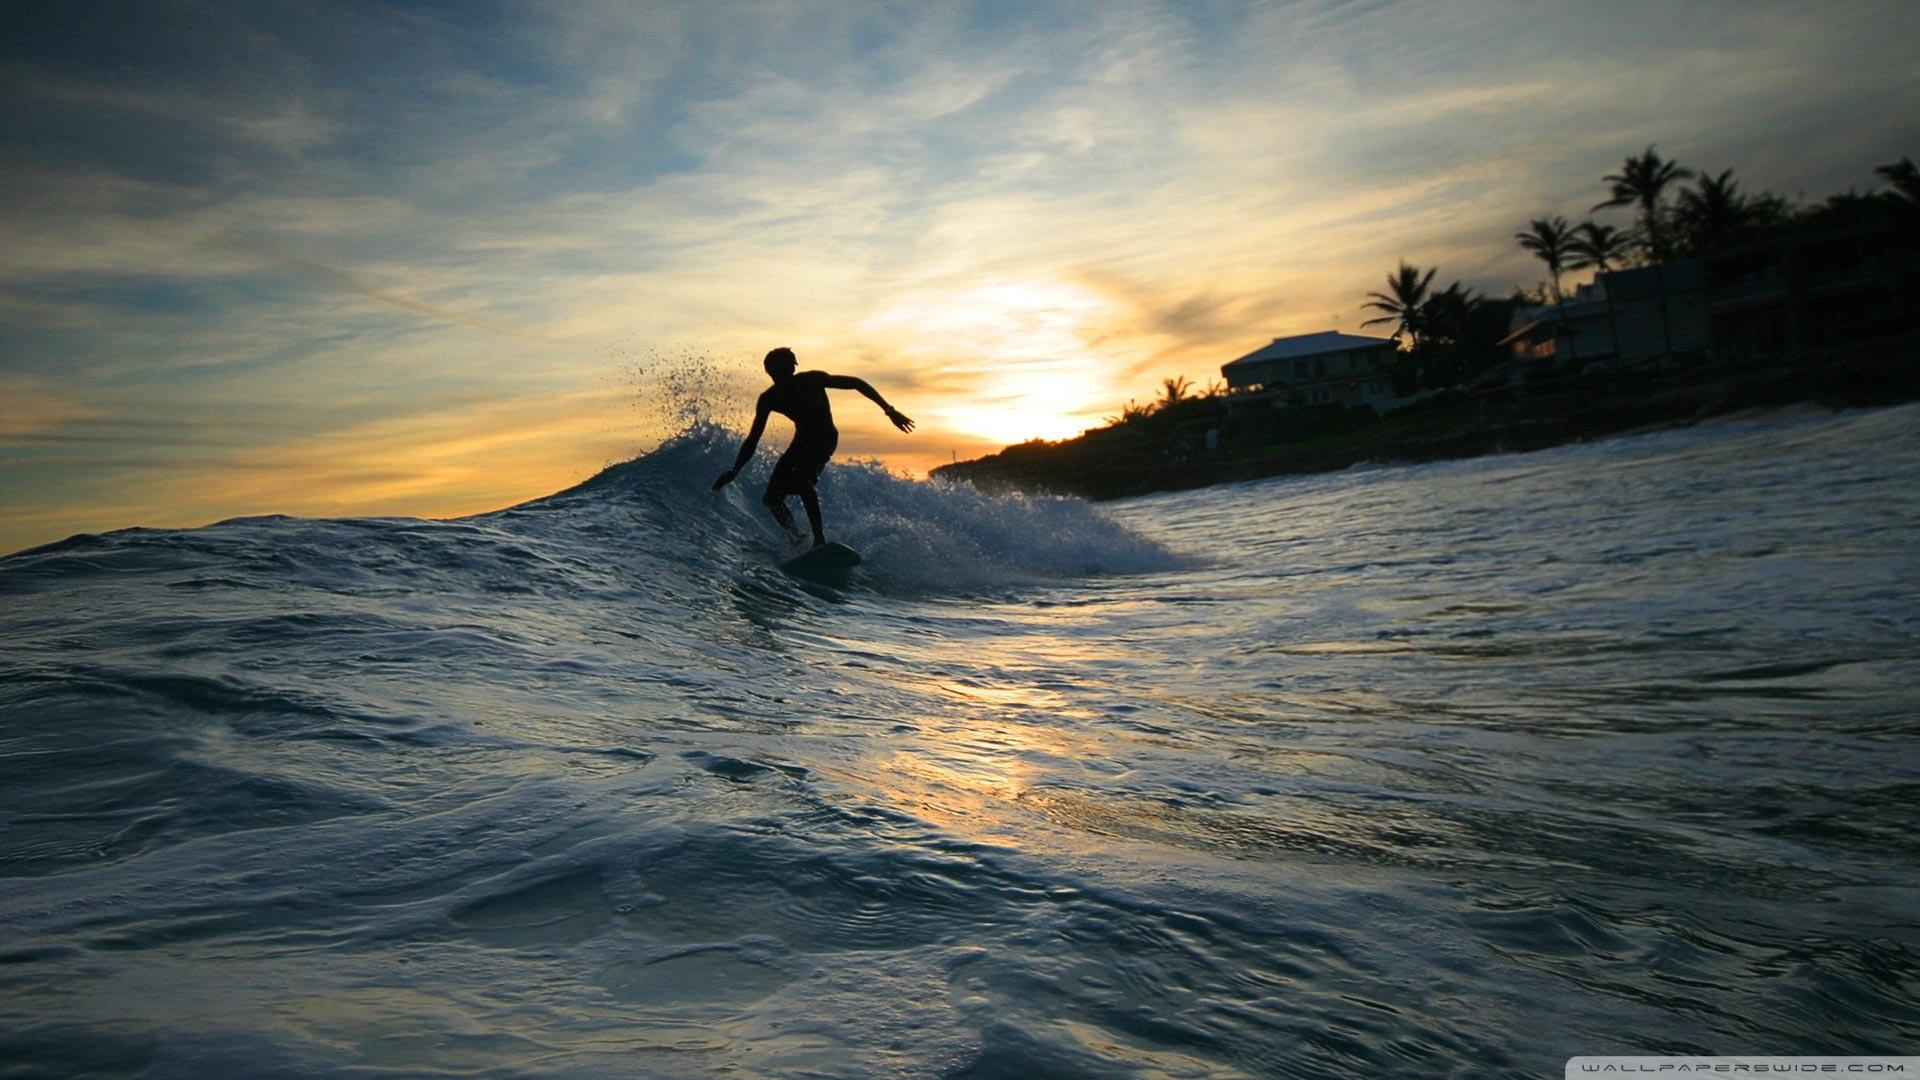 Image: Surf wallpaper HD 0008 - Album: Surf: Wallpaper, wallpapers ...